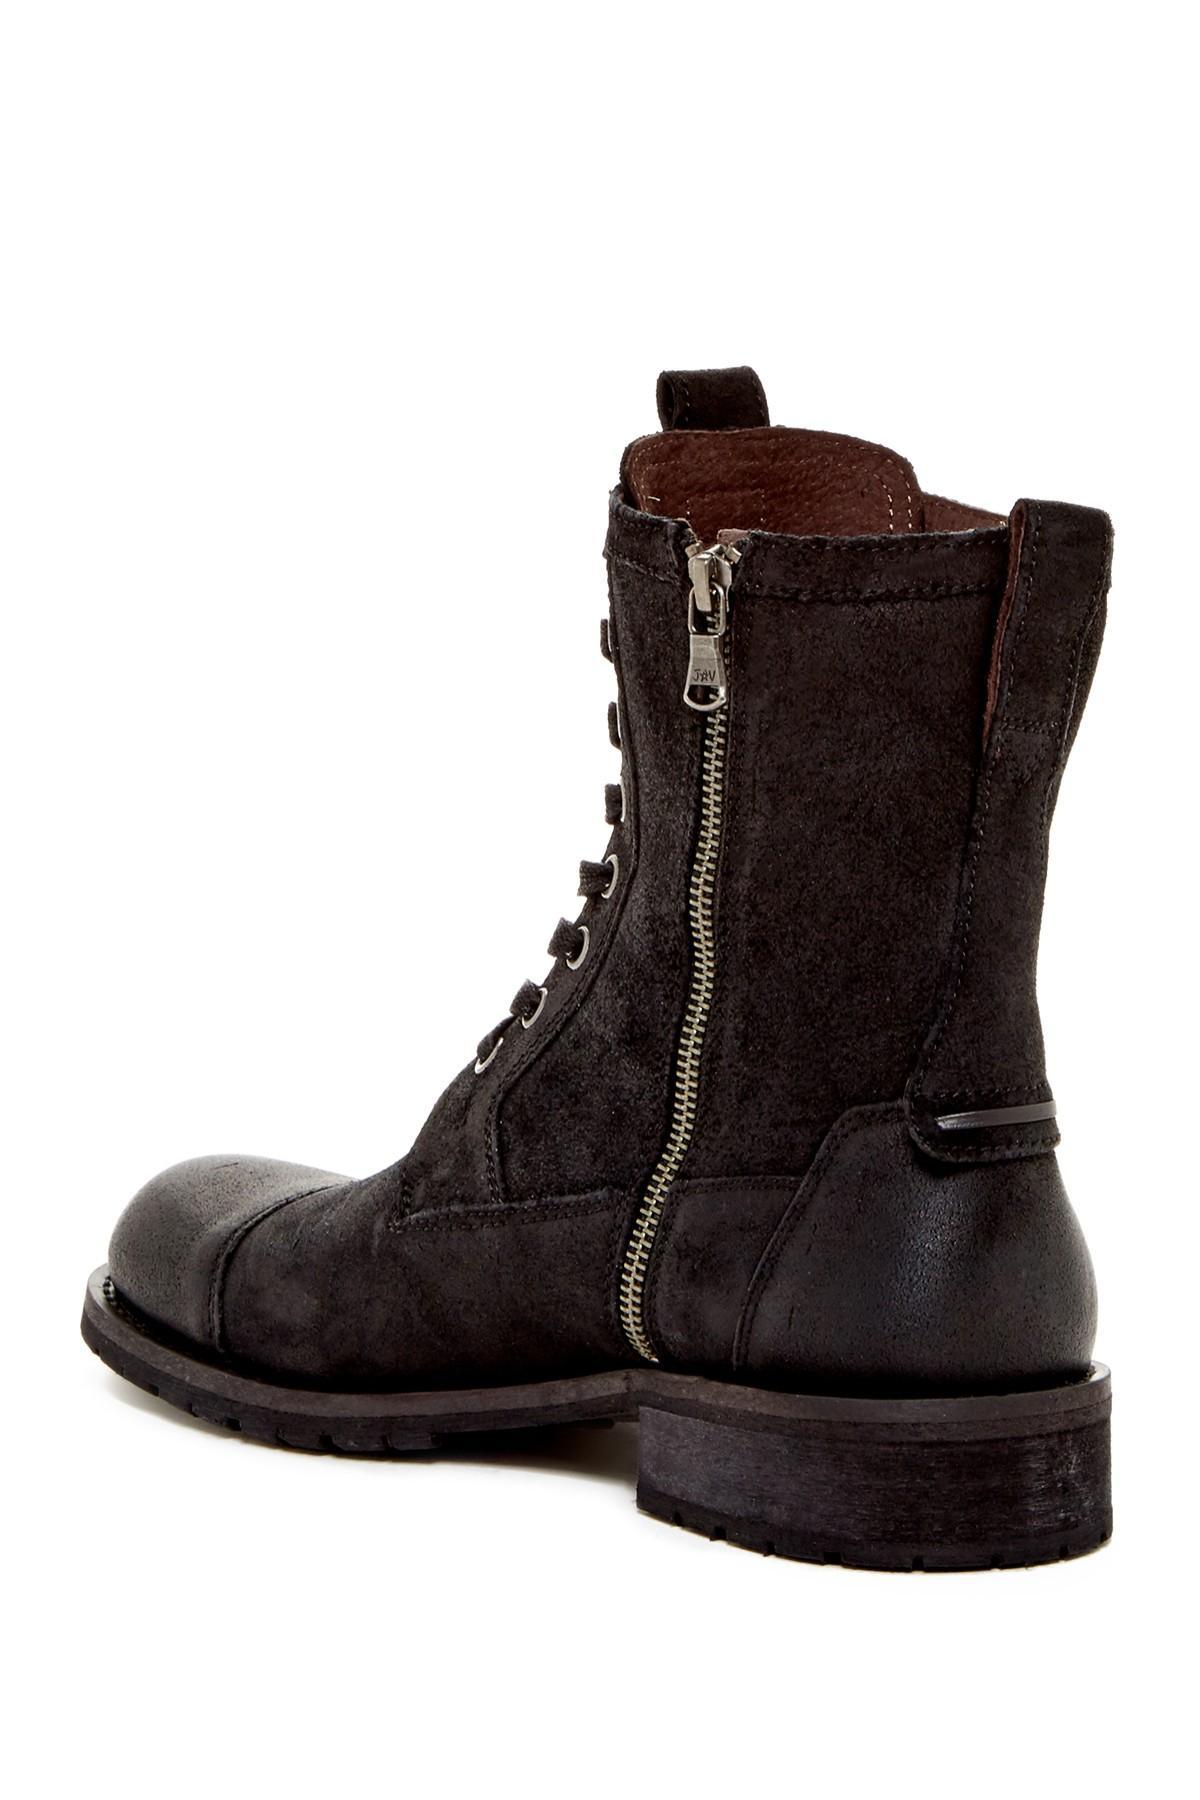 John Varvatos Star S Combat Boot In Black For Men Lyst